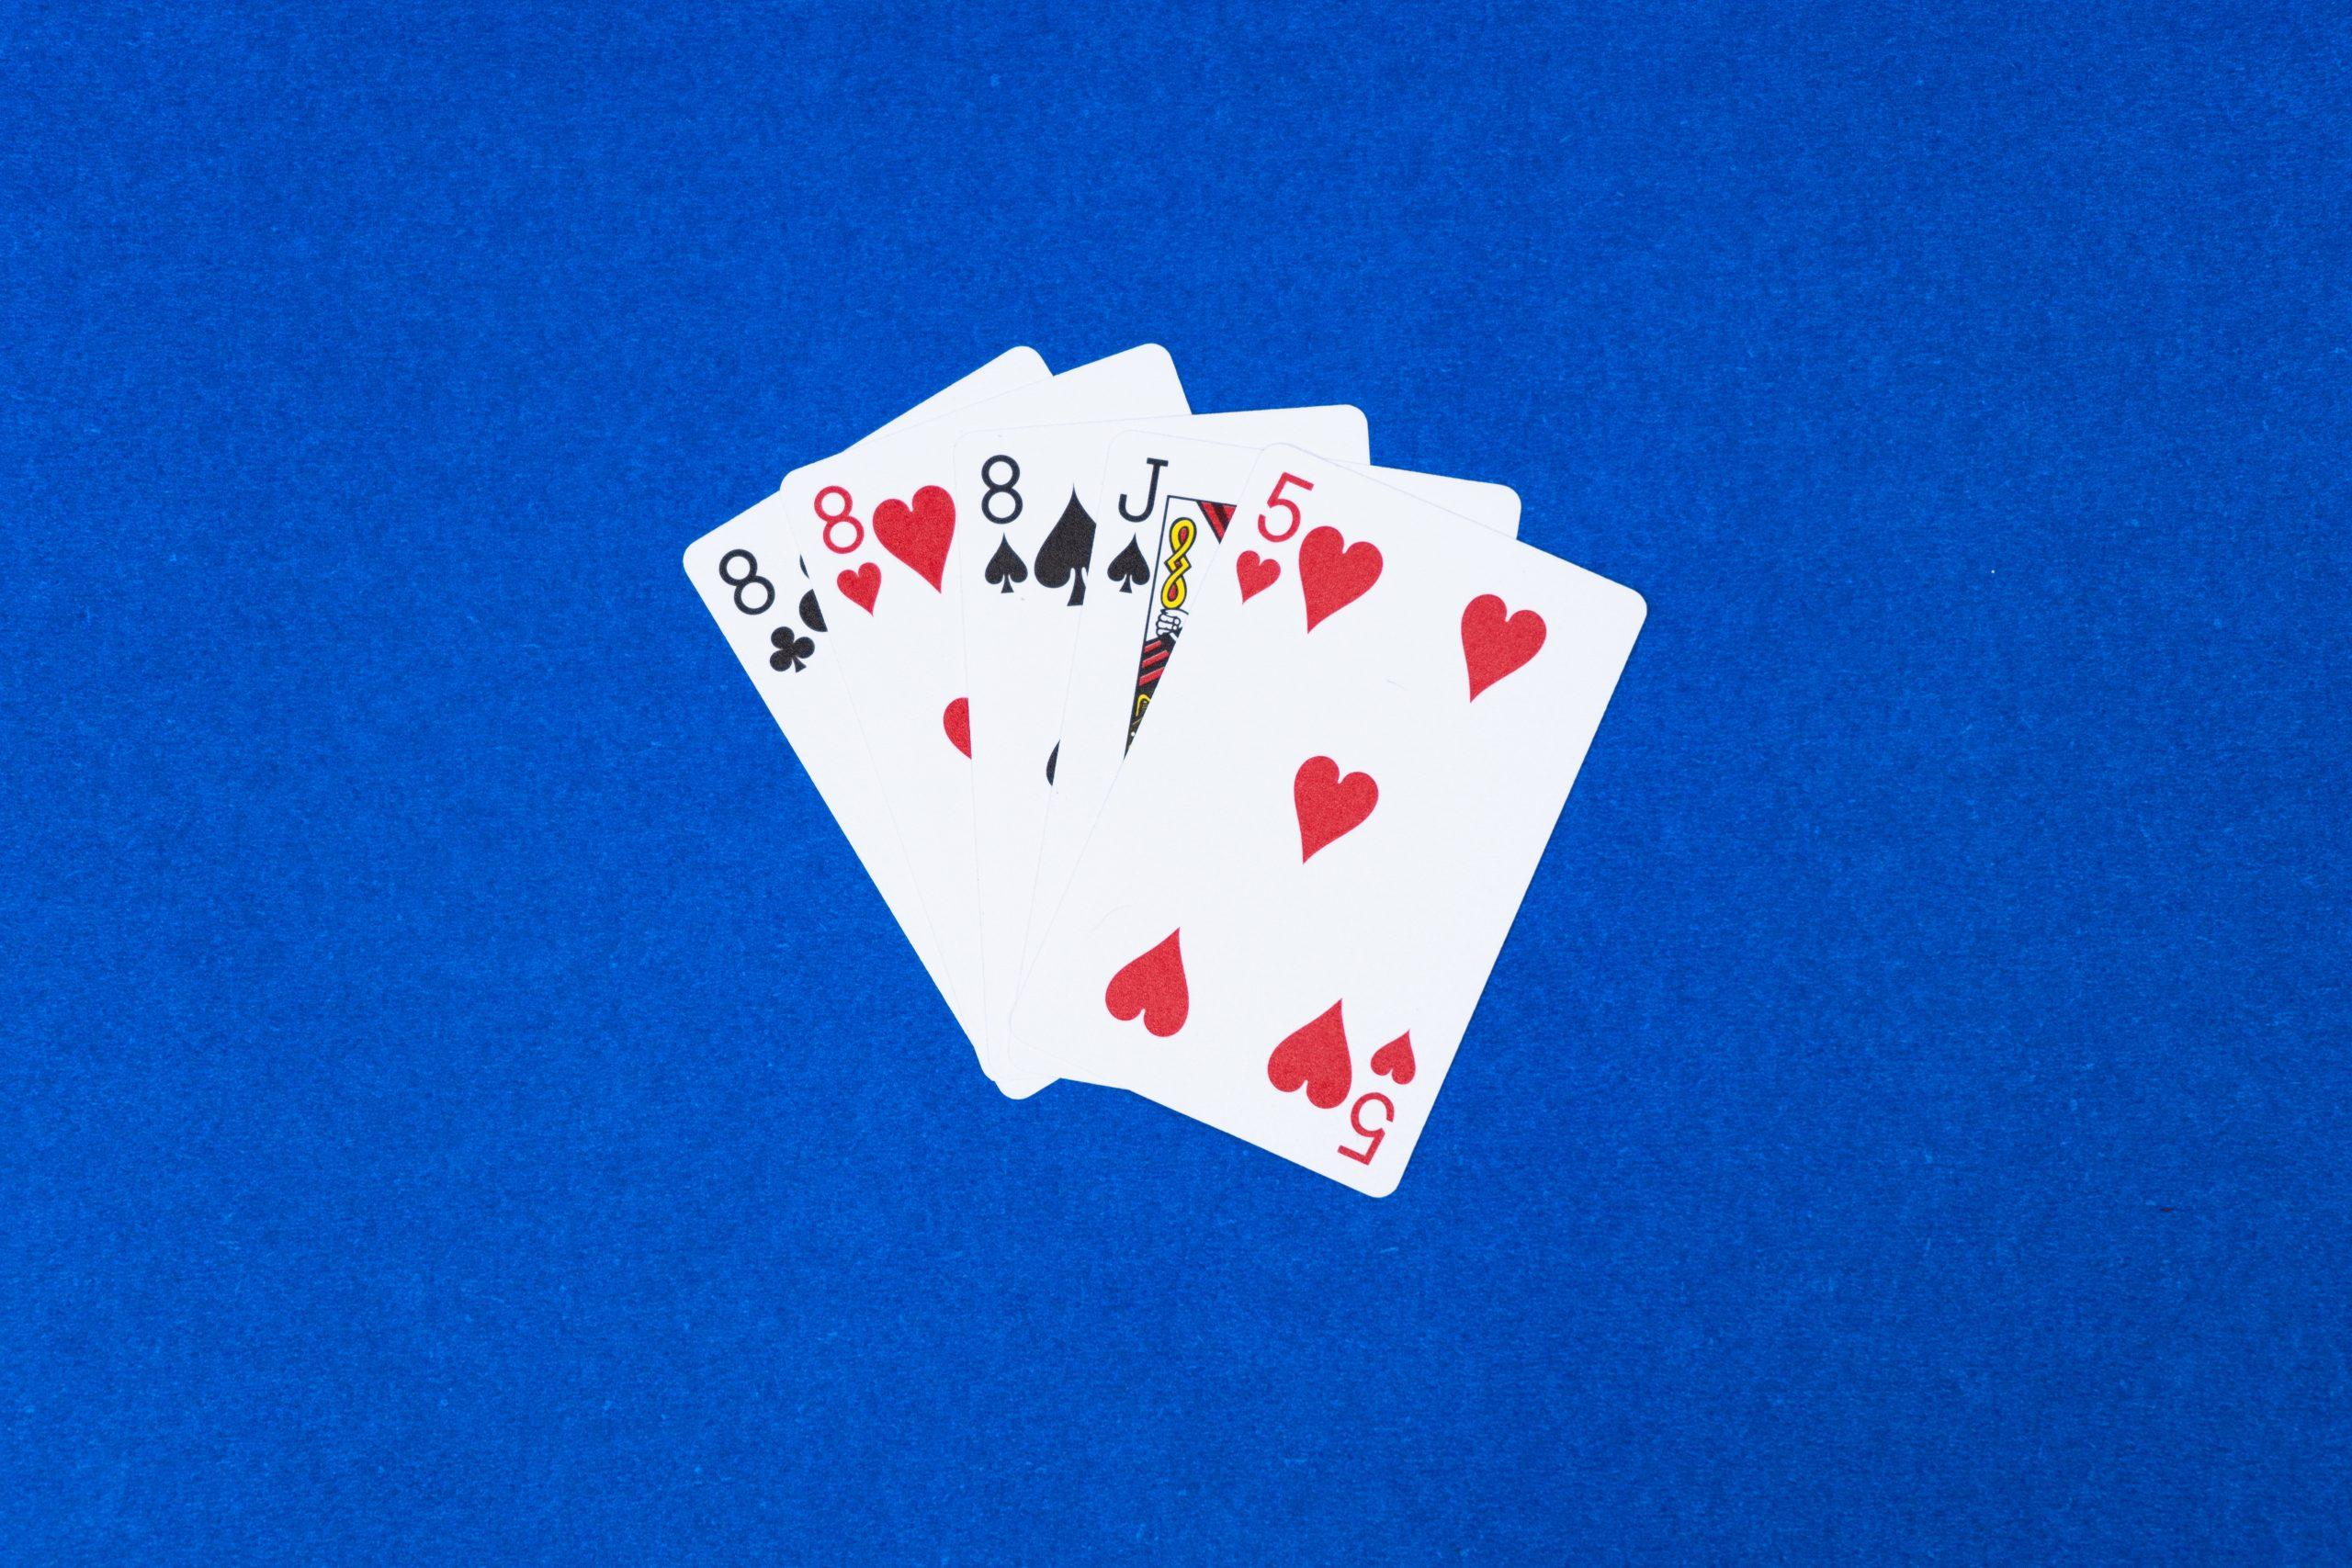 Poker Three of a kind hand